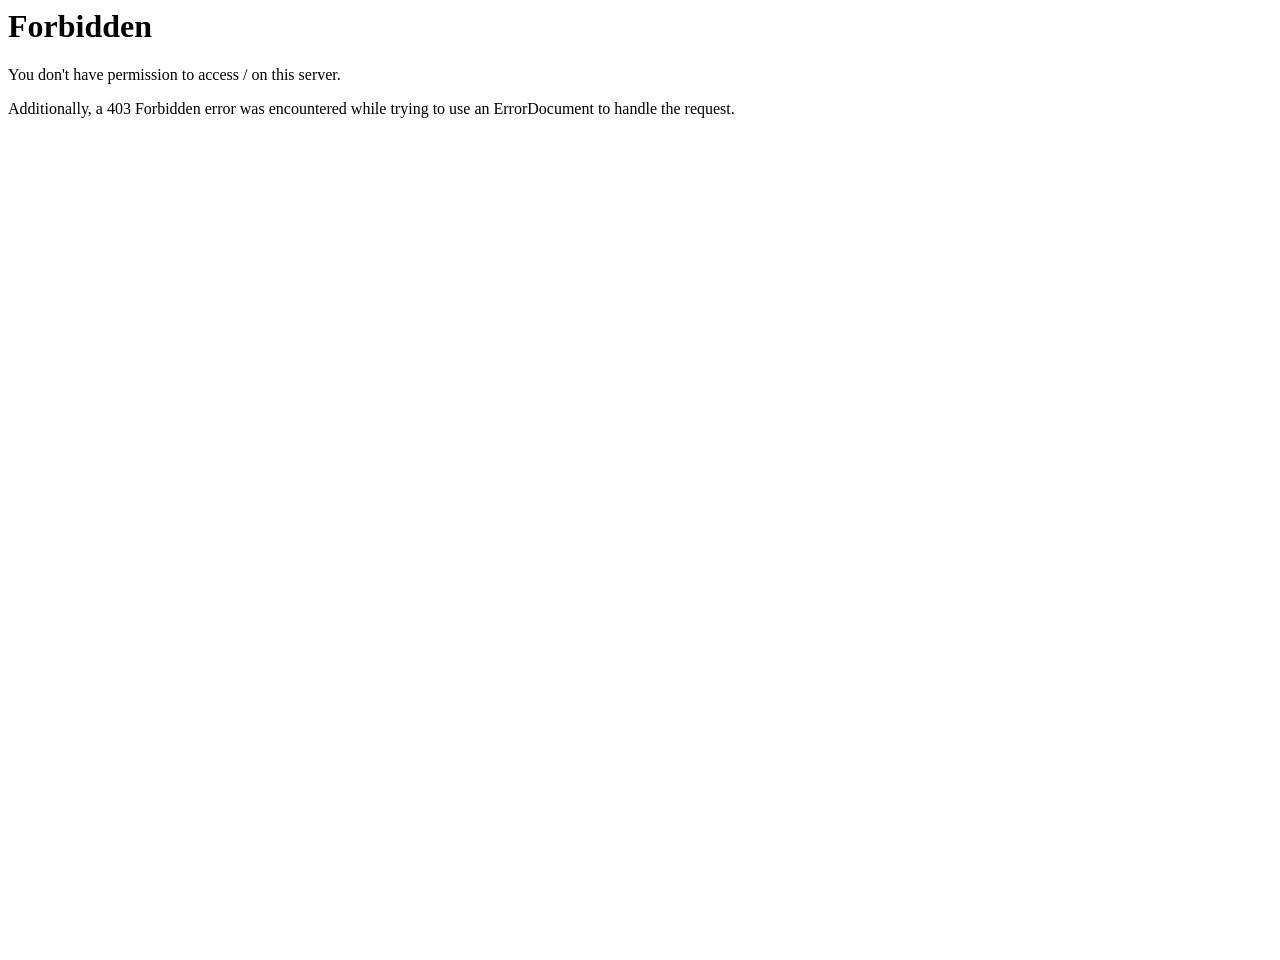 hair make Serve【ヘアーメイク サーブ】